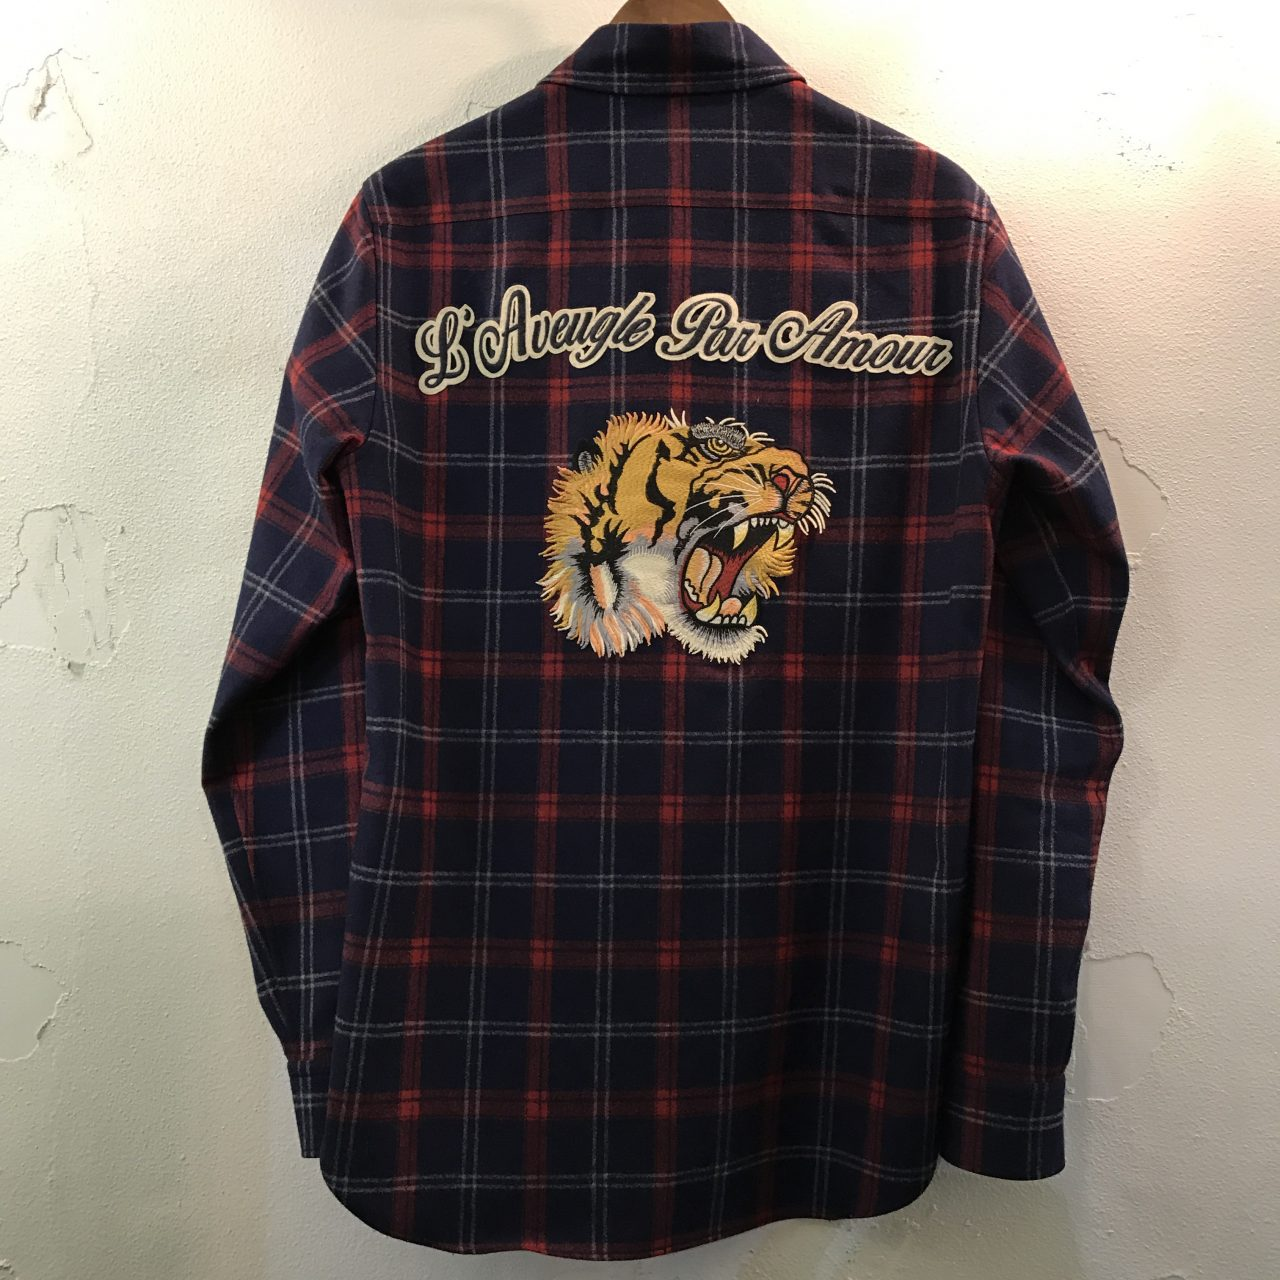 GUCCI 16AW タイガーパッチチェックネルシャツ 38